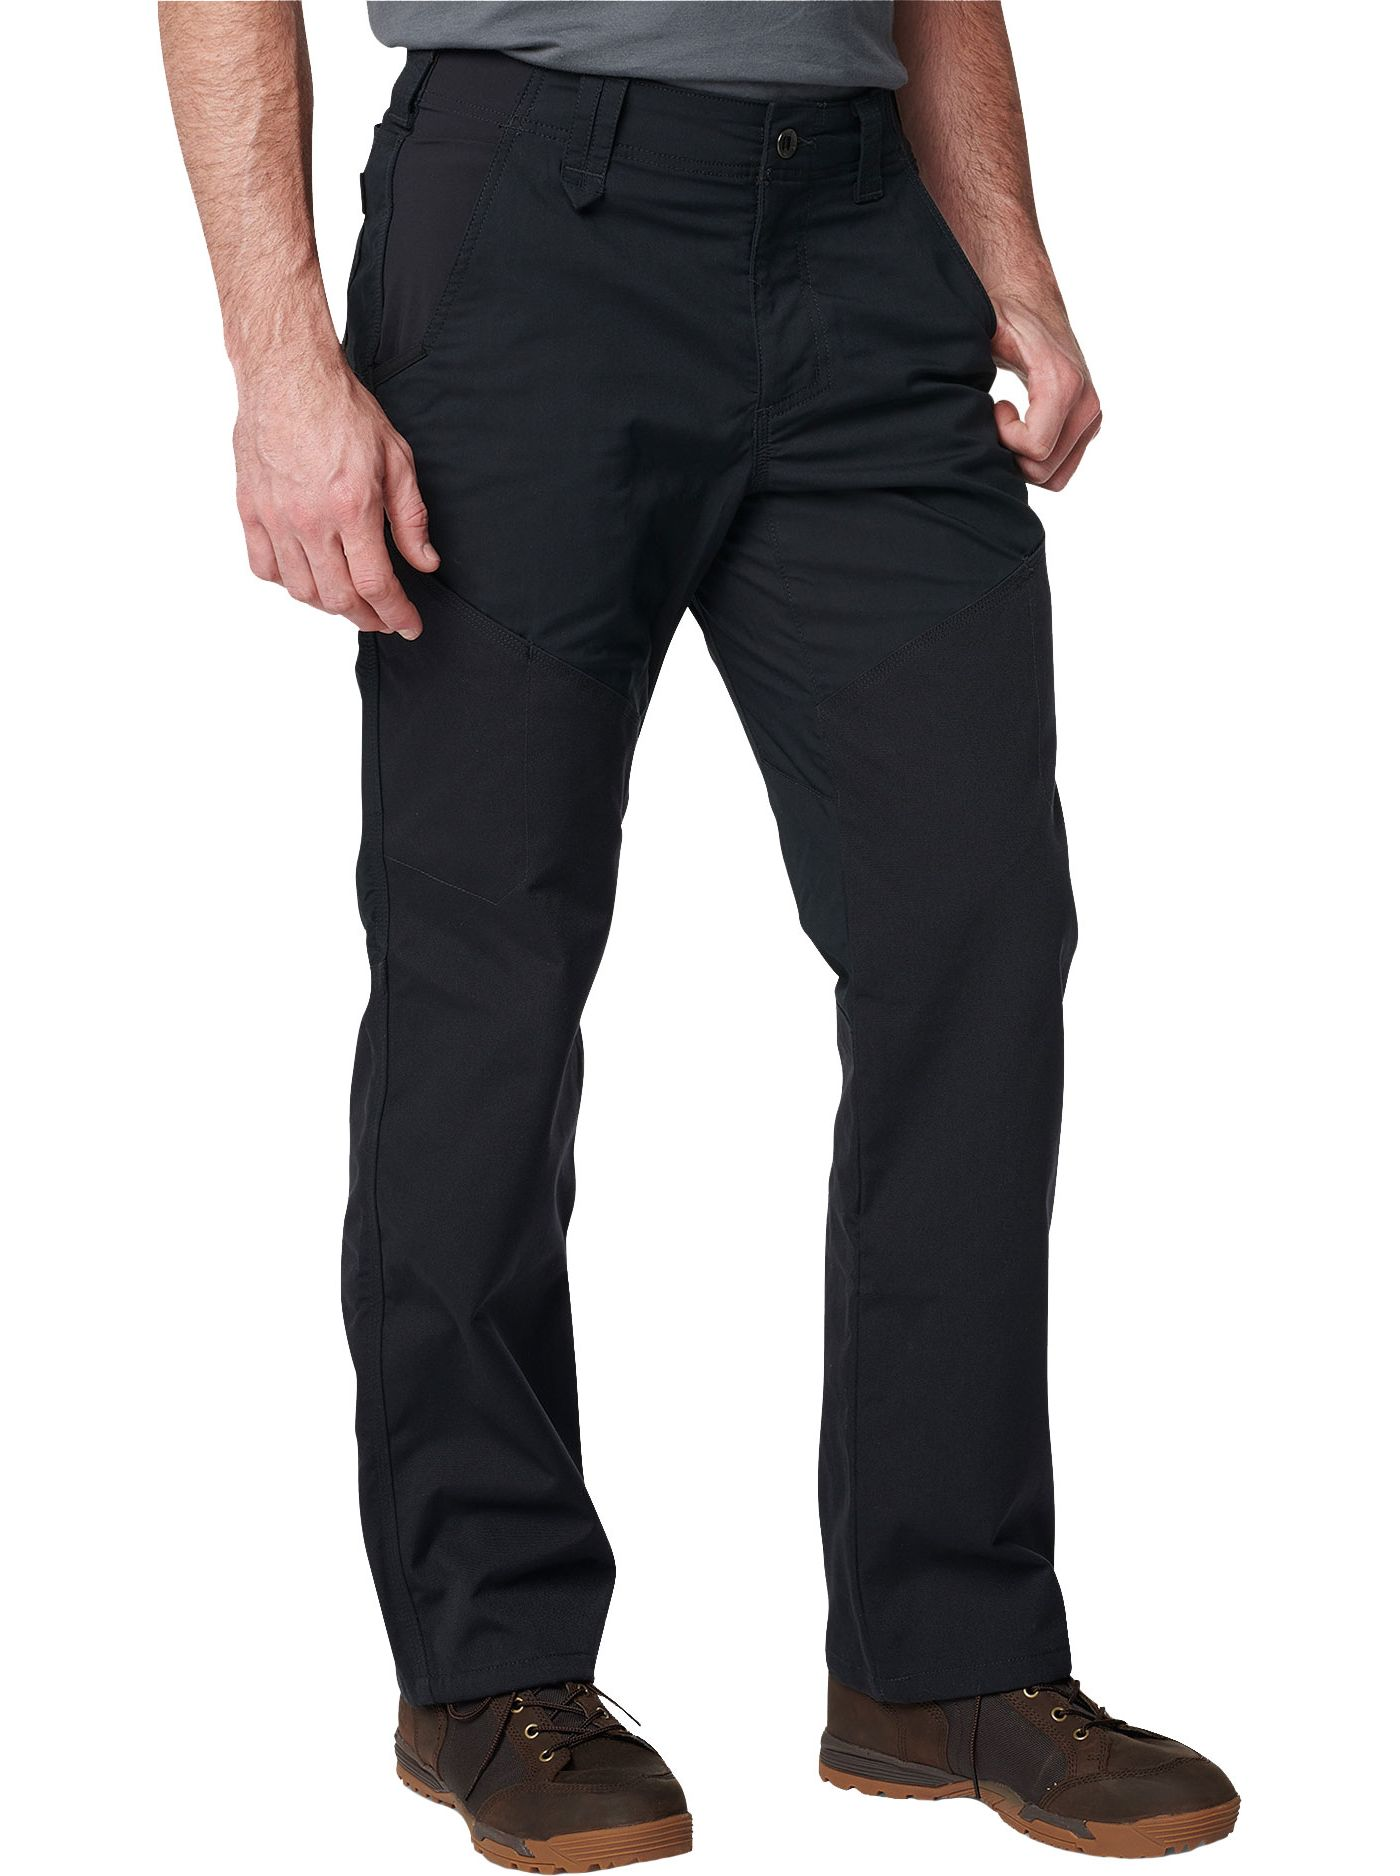 5.11 Tactical Men's Stonecutter Pants